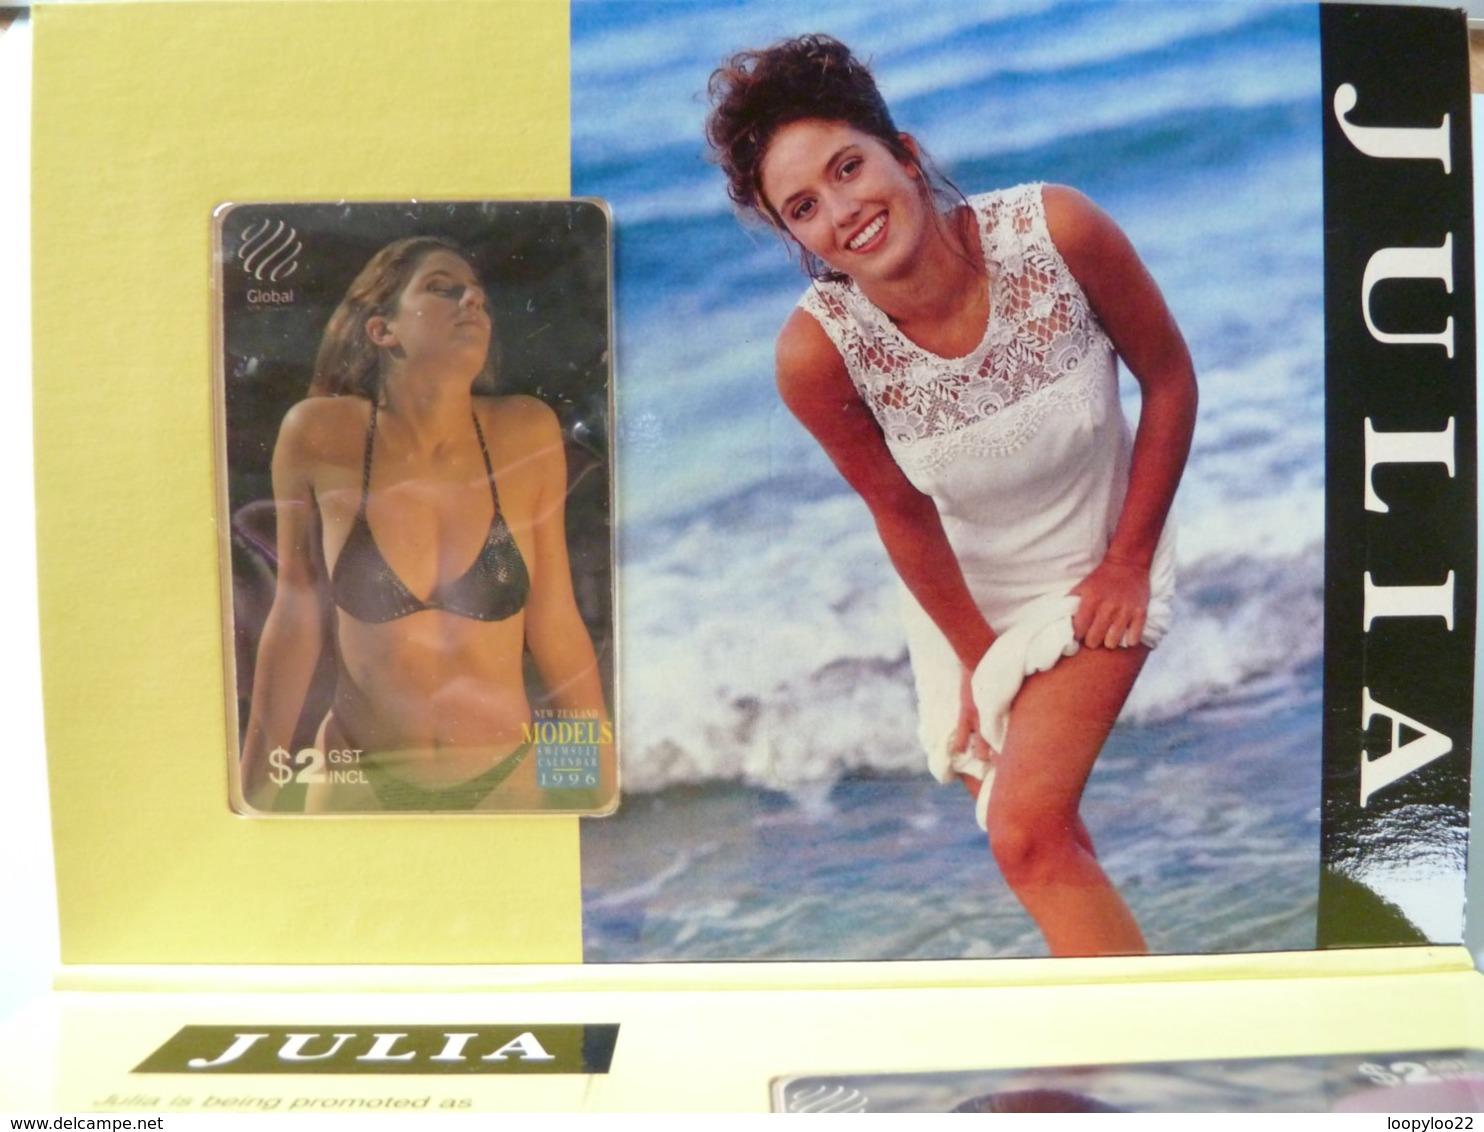 New Zealand - Global - $2 - 1996 Swimsuit Calendar - Julia - Set Of 2 - 1500ex - Mint In Folder - New Zealand